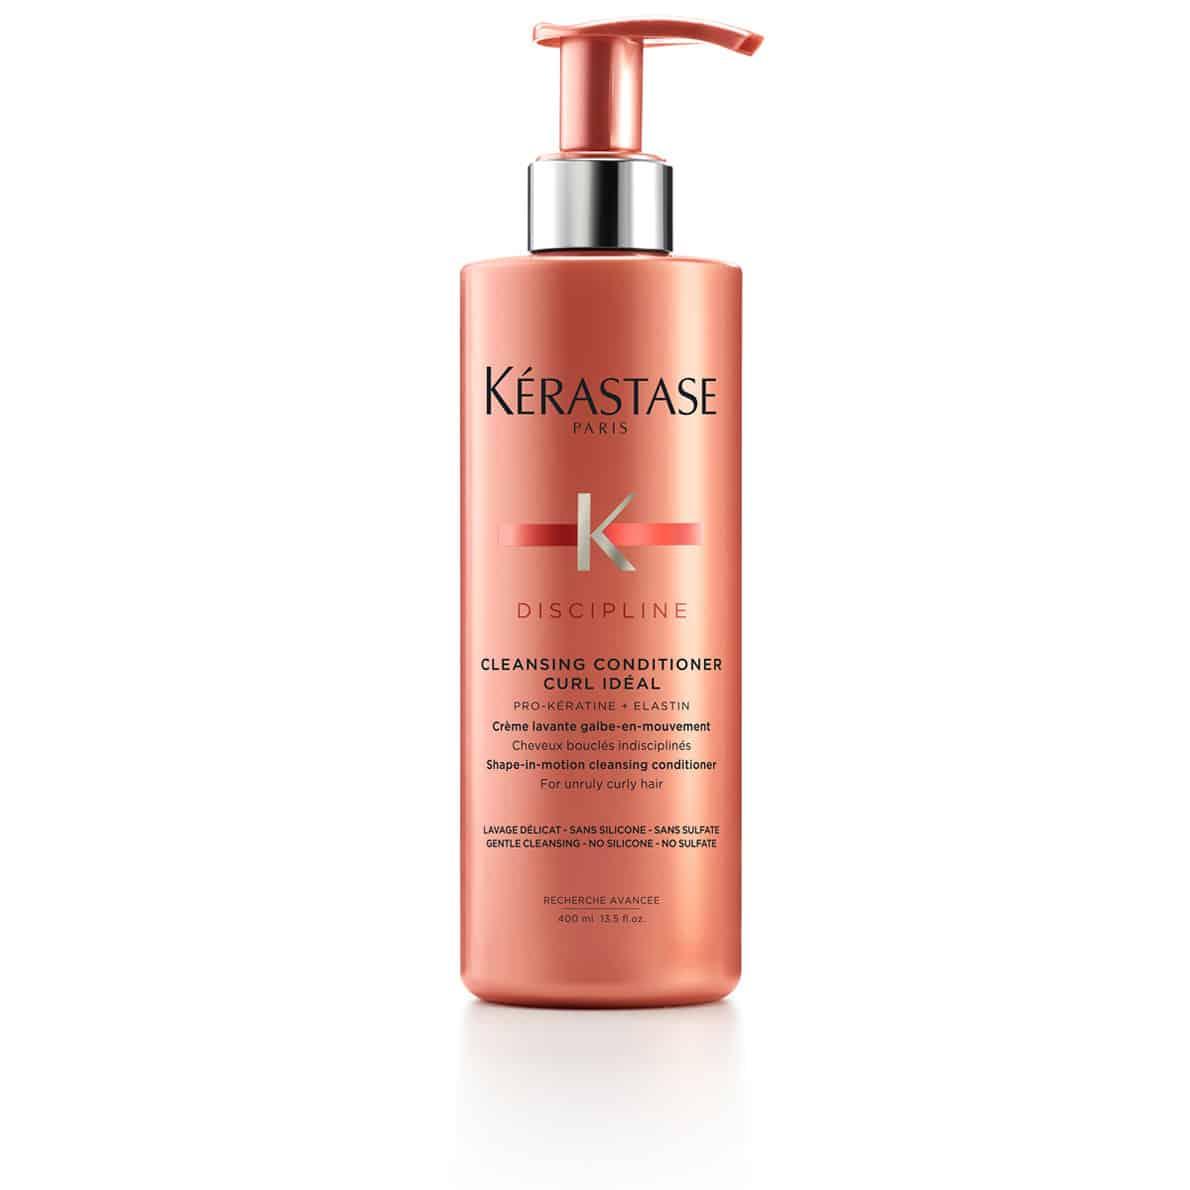 kerastase cleansing conditioner curl ideal